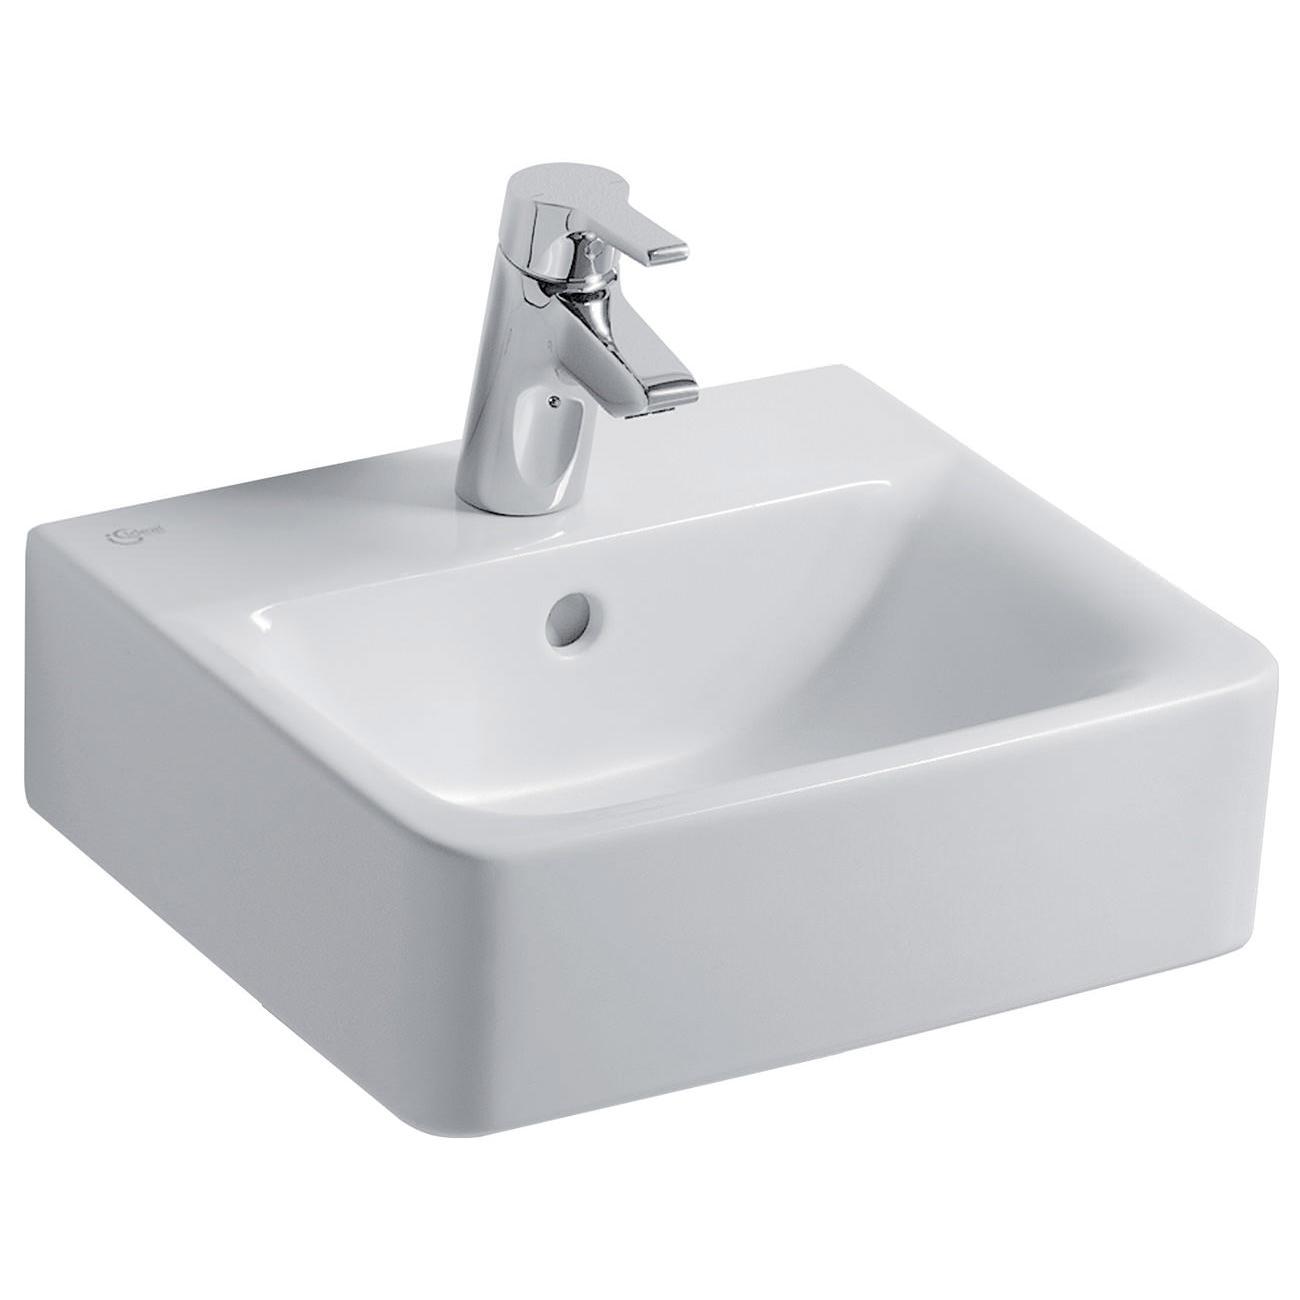 ideal standard concept cube 400mm 1 taphole handrinse basin. Black Bedroom Furniture Sets. Home Design Ideas